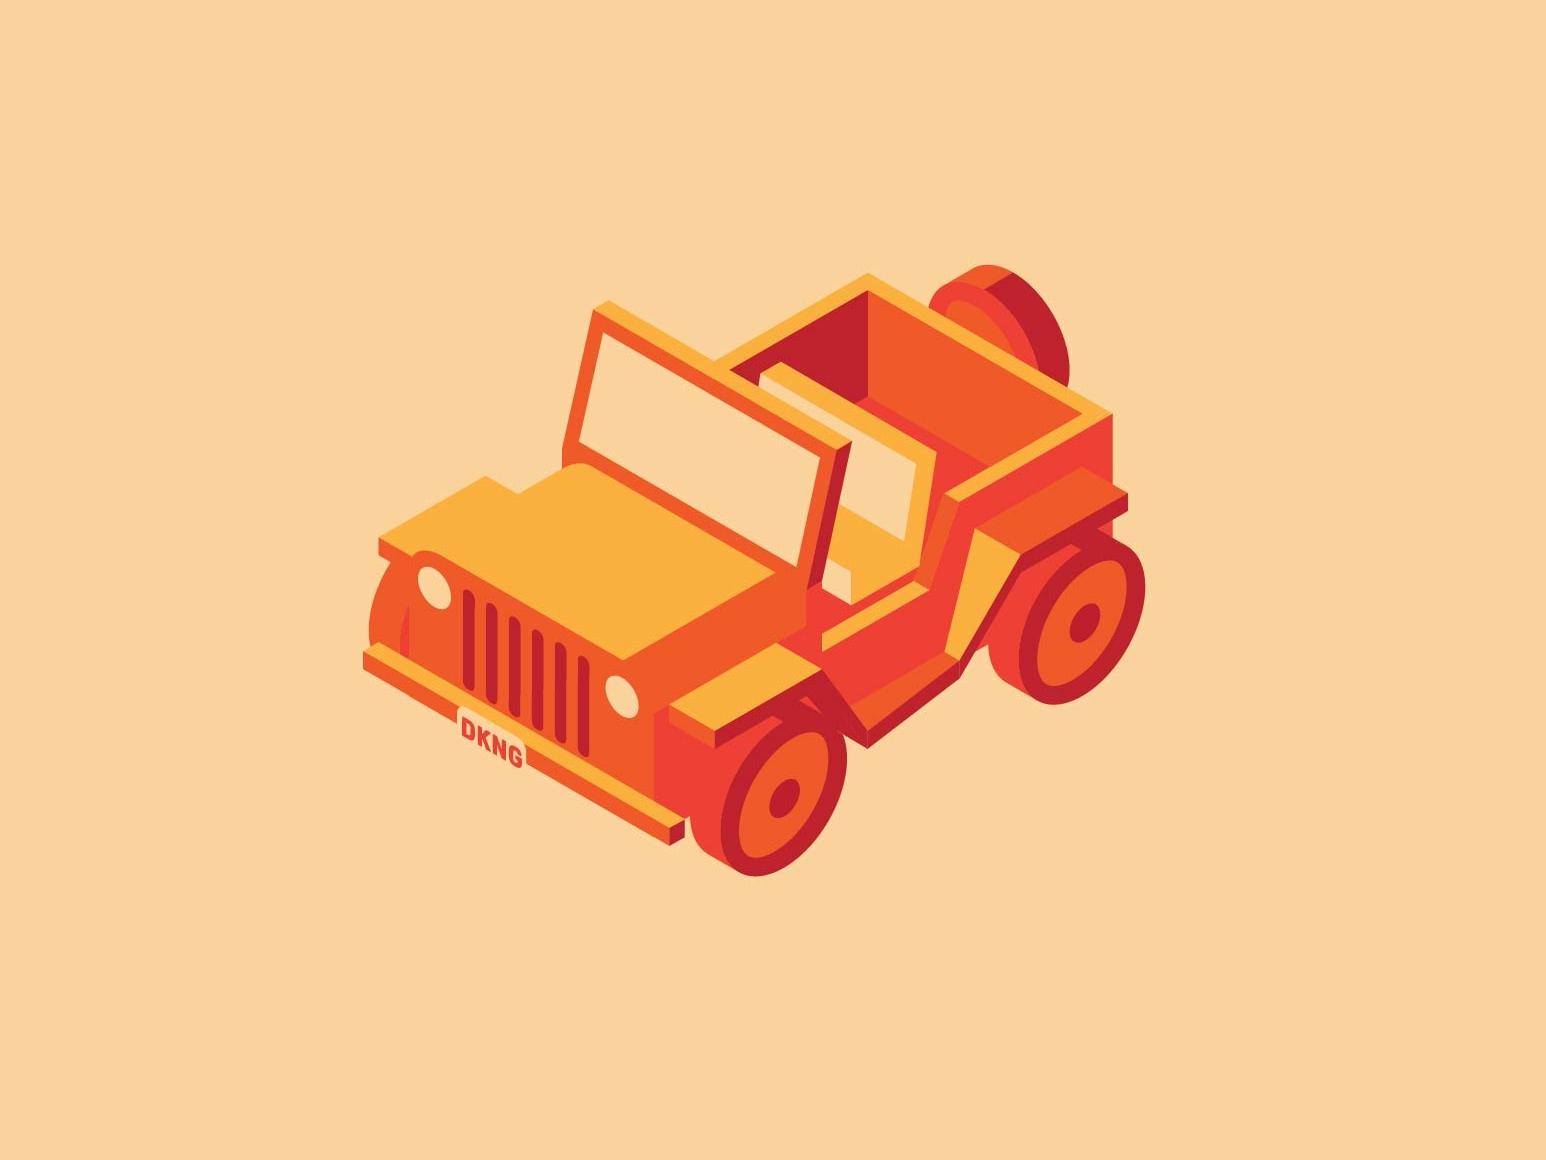 Isometric Jeep skillshare jeep orange red illustration design cars automotive vector kansas city